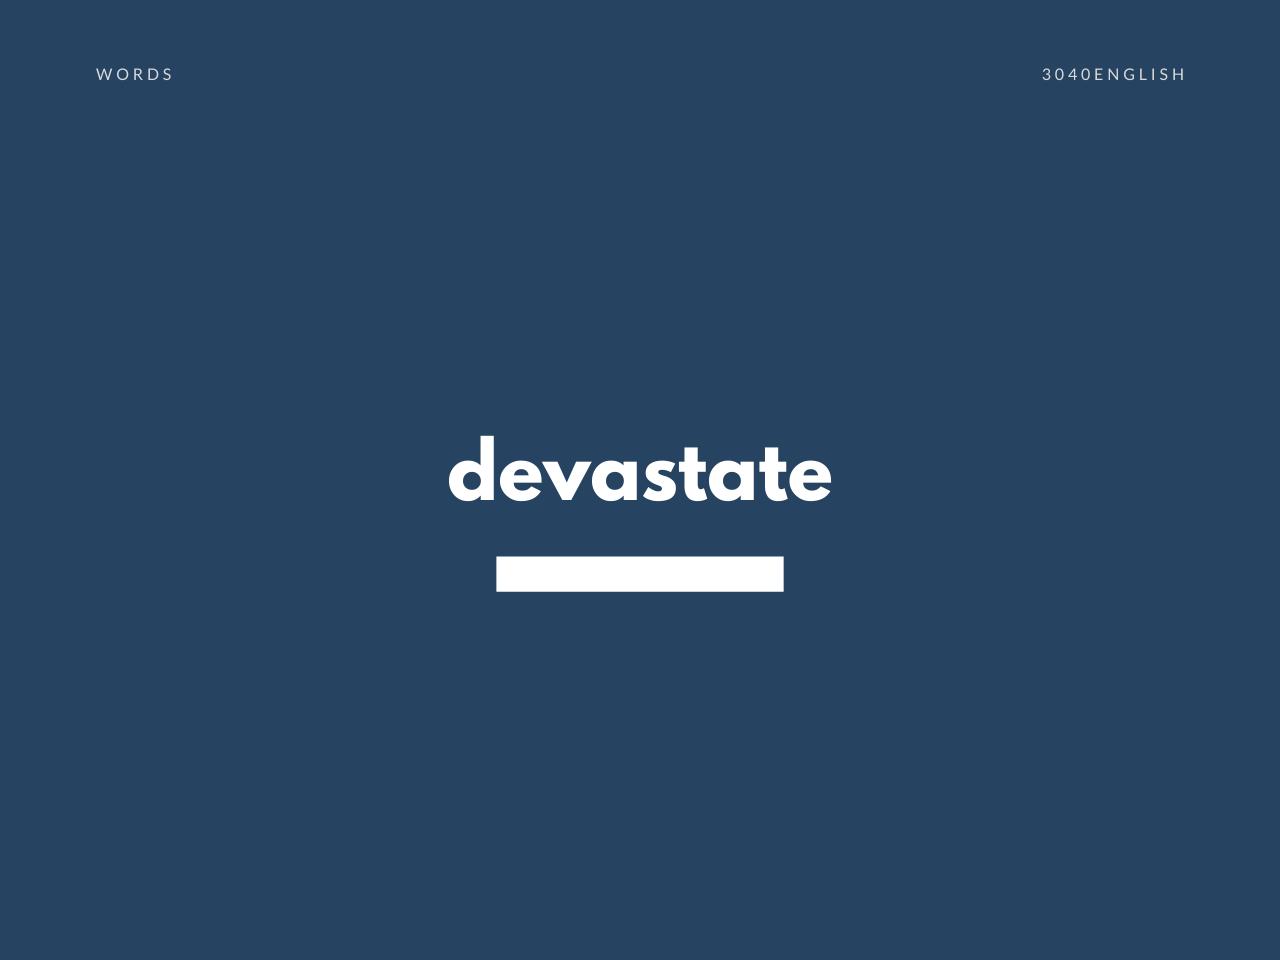 devastate の意味と簡単な使い方【音読用例文あり】